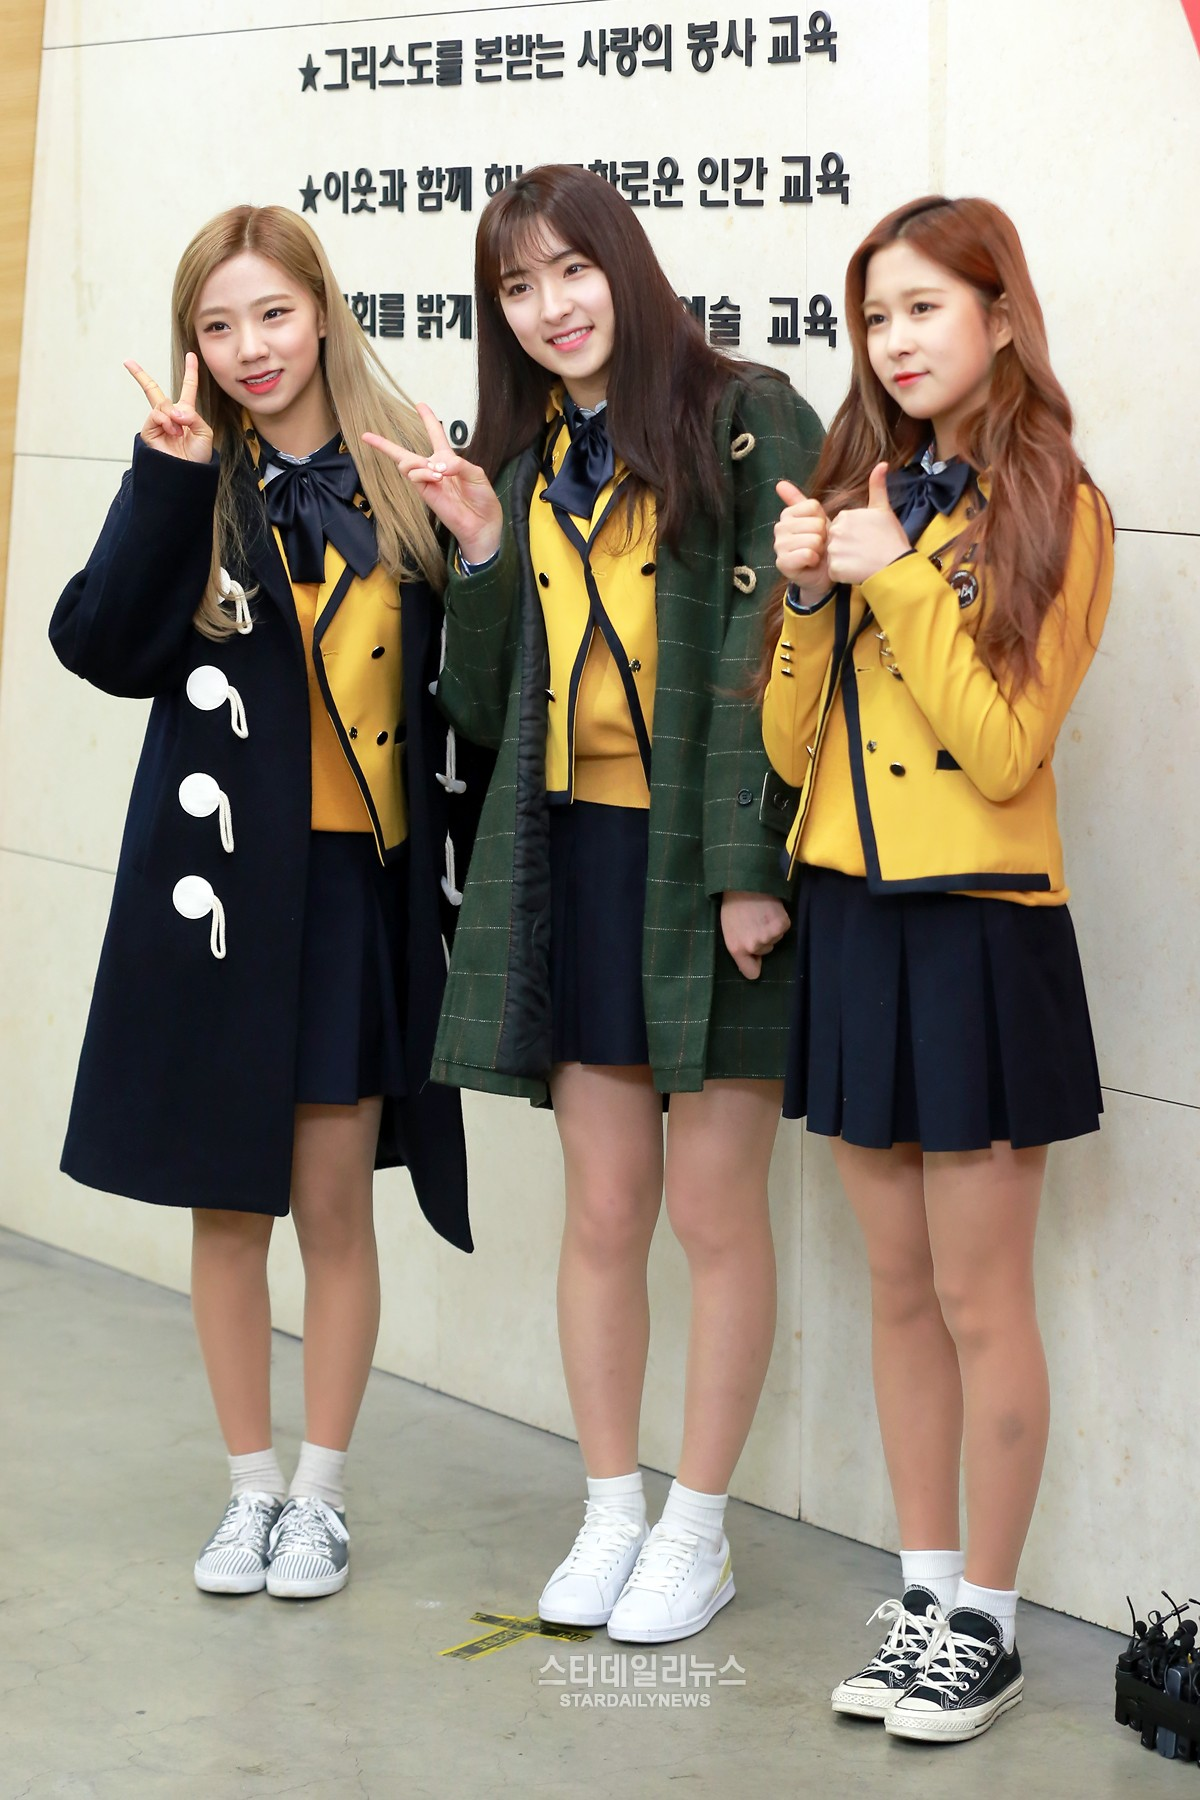 cosmic girls graduation star daily news